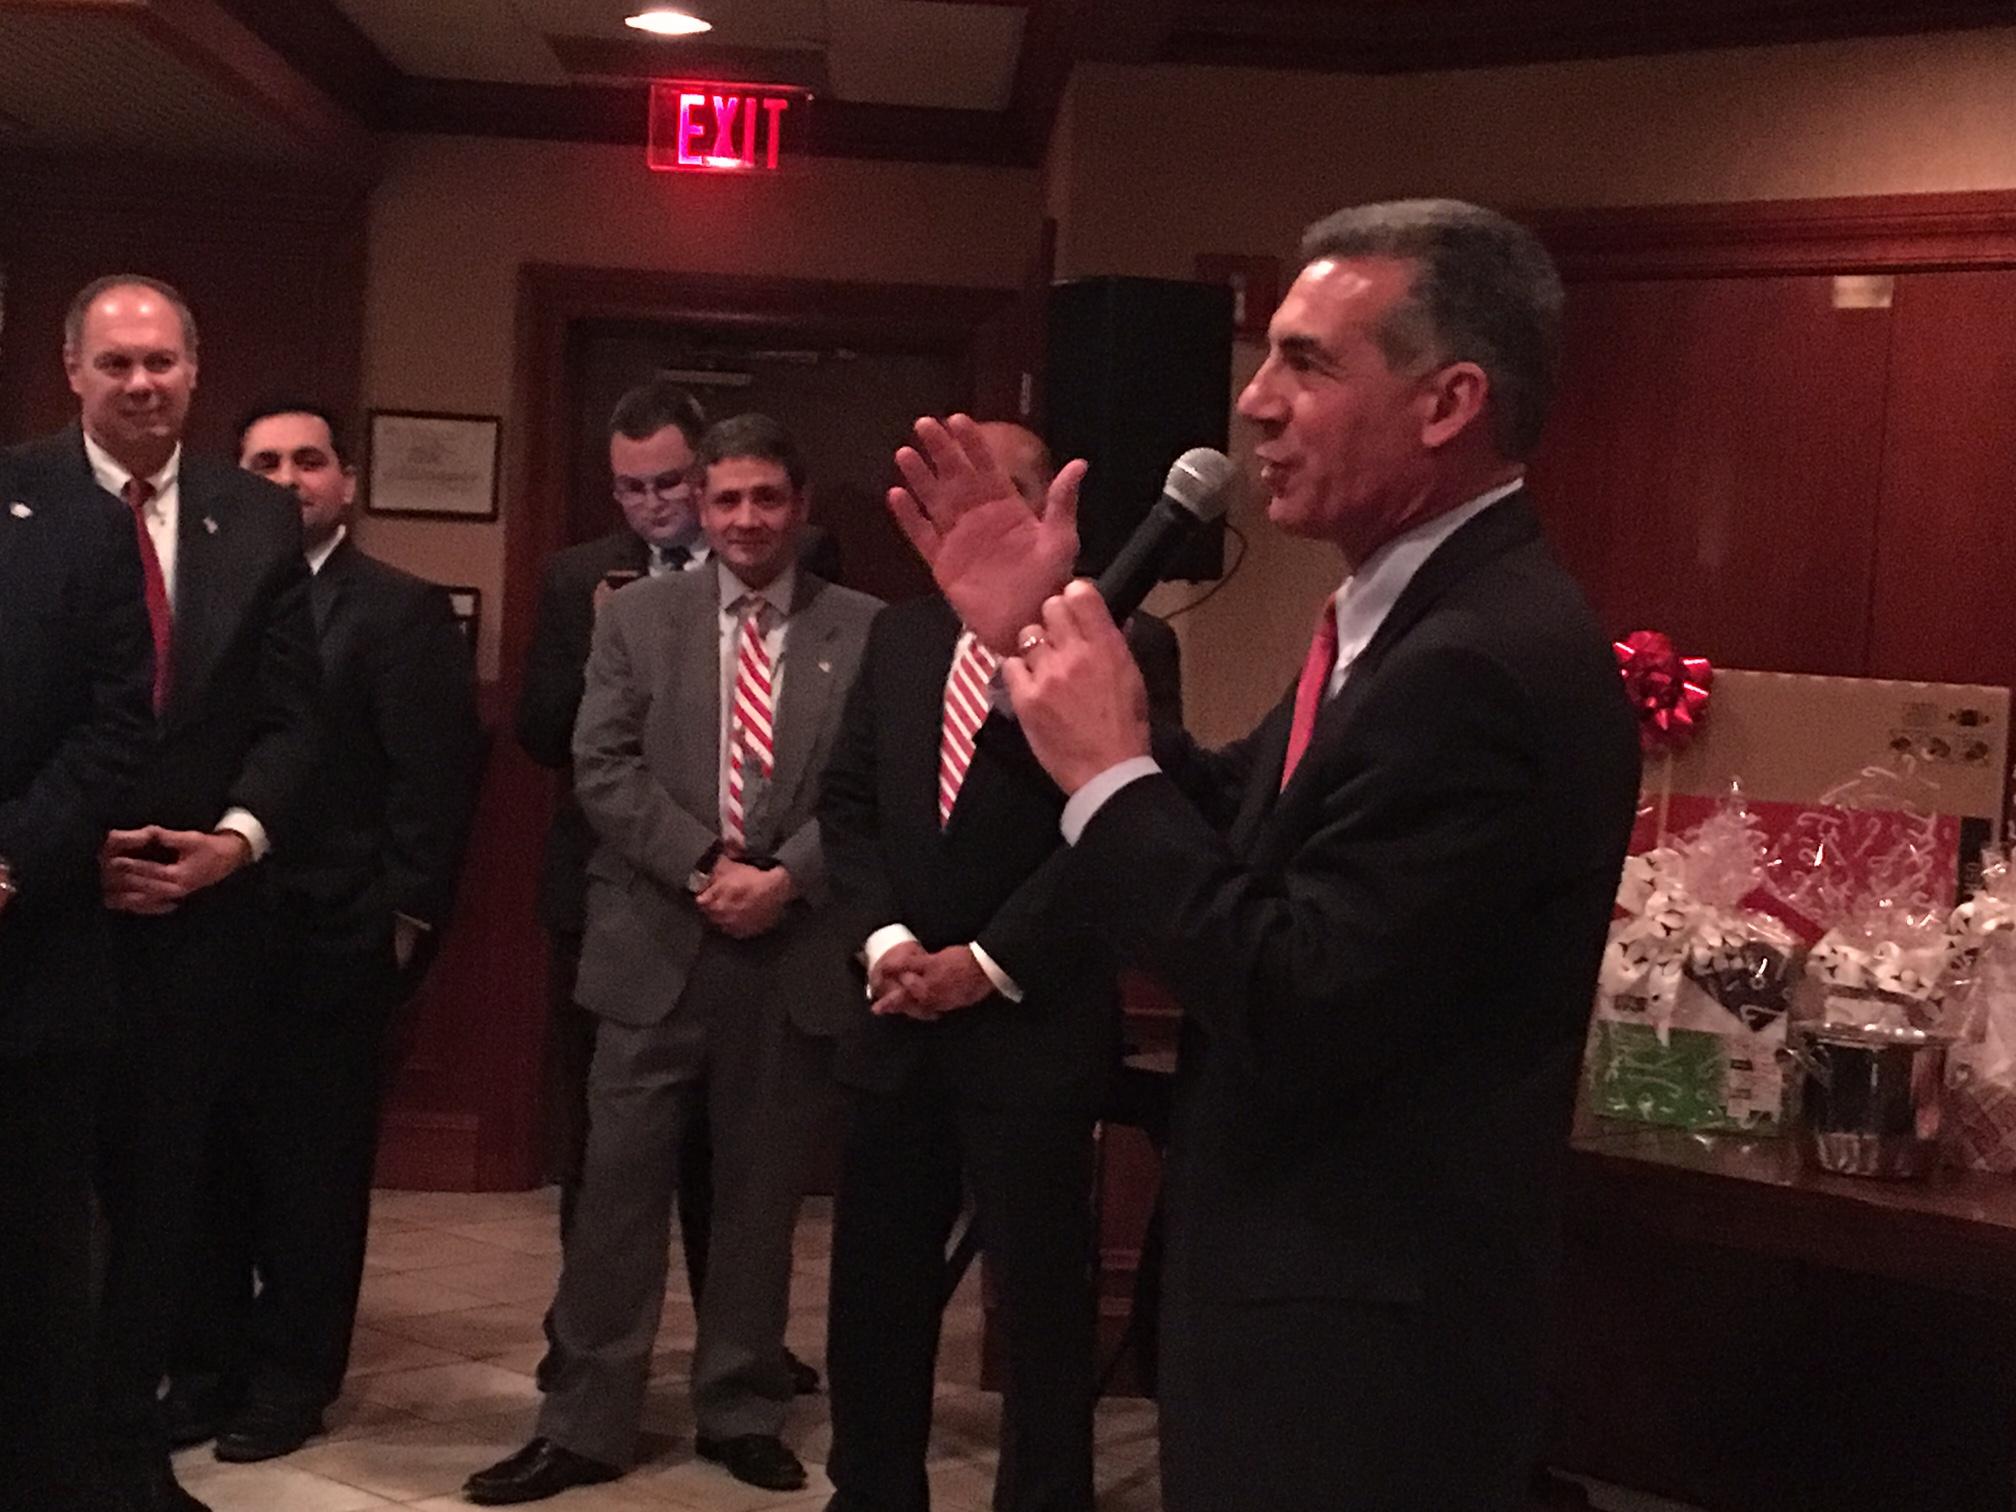 Jack Ciattarelli is the assemblyman from New Jersey's 16th legislative district.